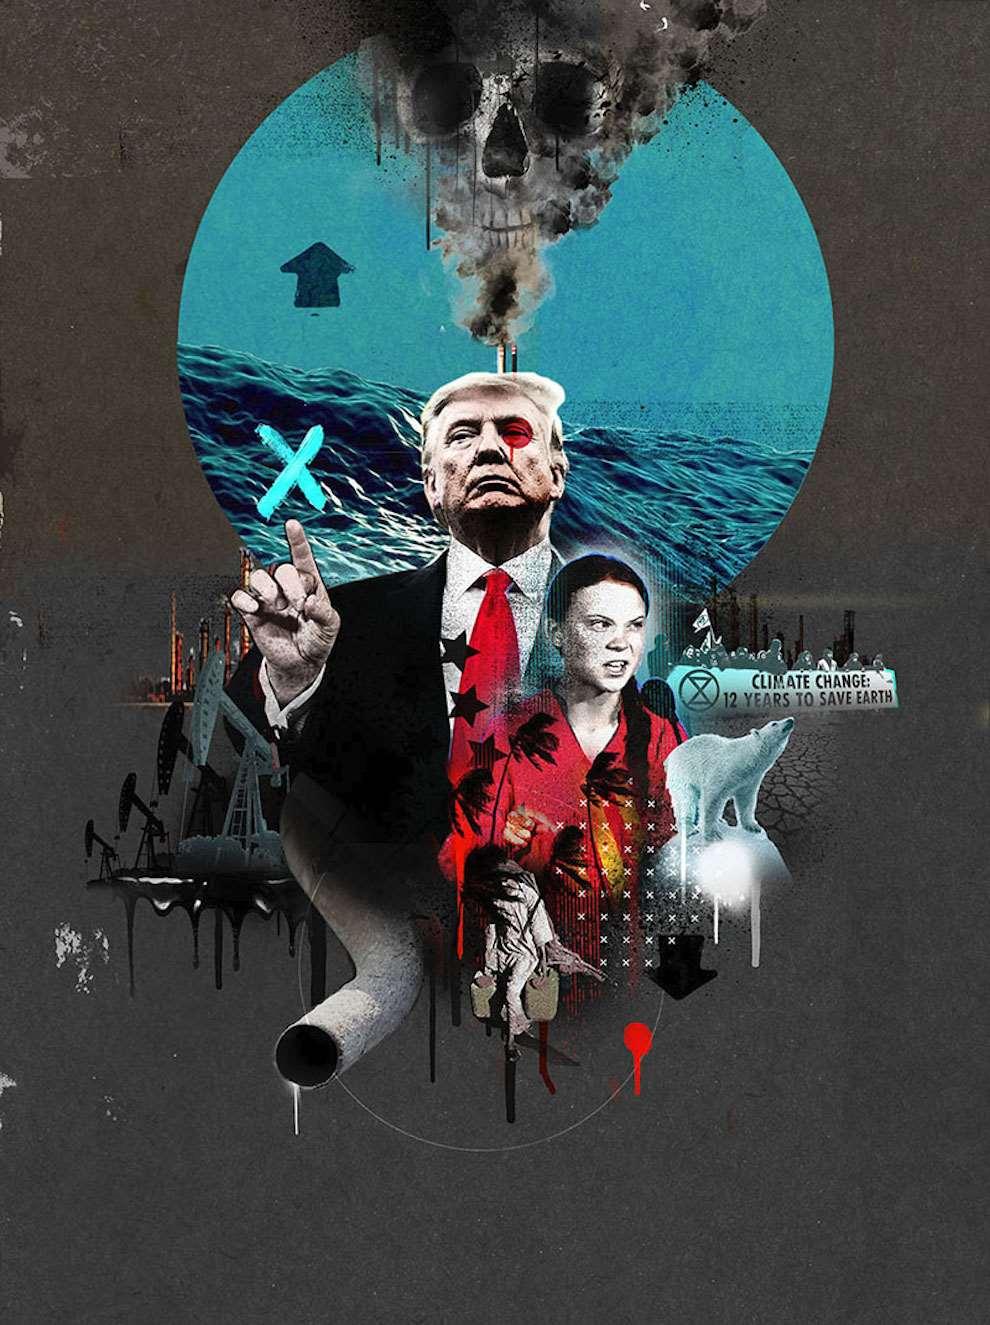 Tim Marrs, Photo collage and painterly brush elements illustration of trump against Greta Thunberg